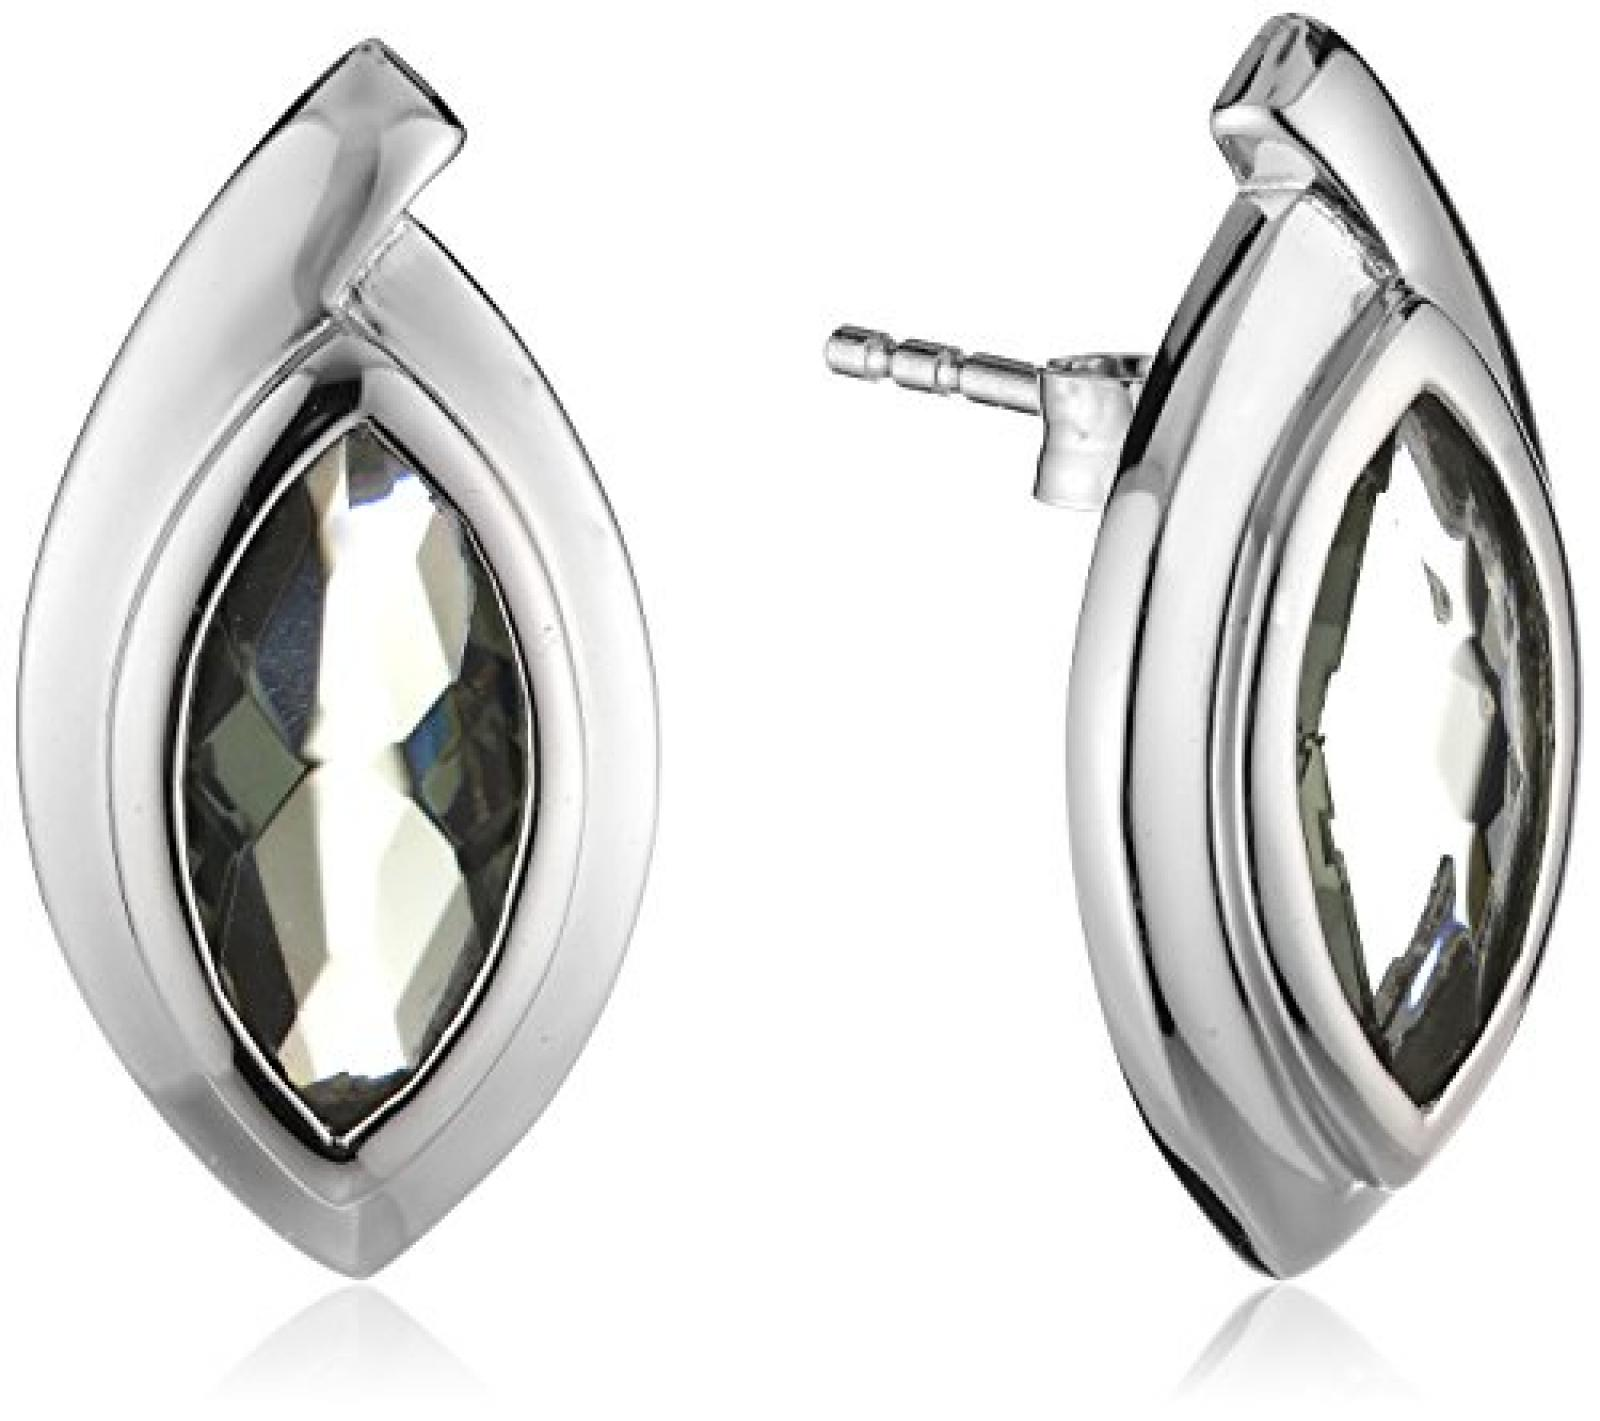 Celesta Damen-Ohrstecker 925 Sterling Silber Glaskristall grau 360220377-3L